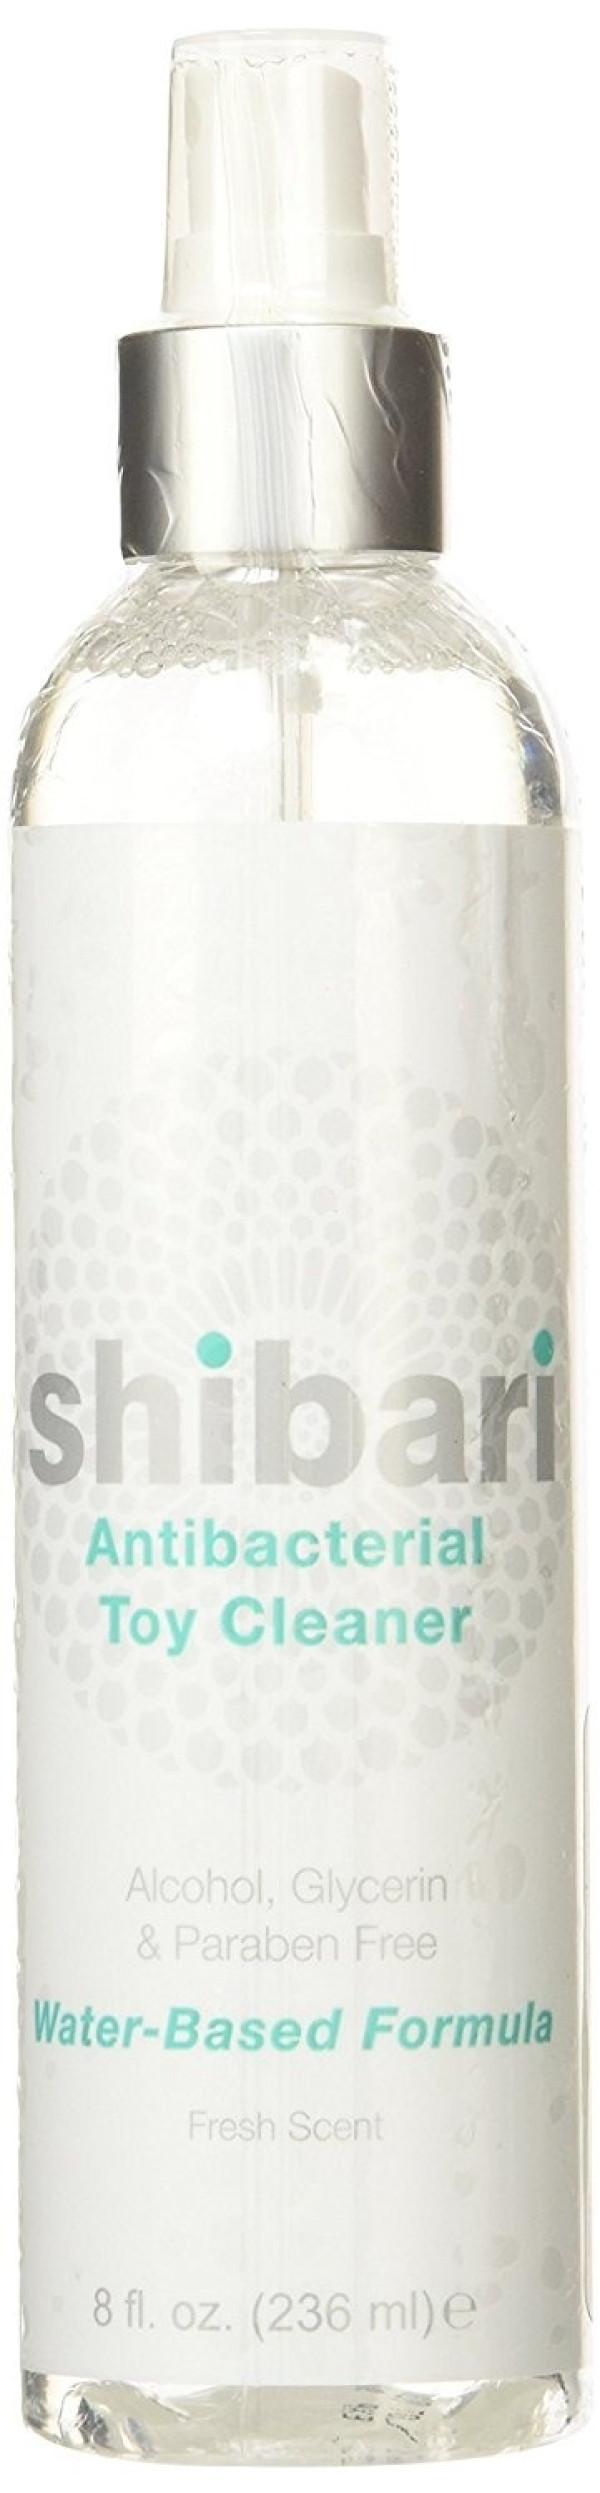 Shibari Water Based Antibacterial Toy Cleaner 8oz Spray Head